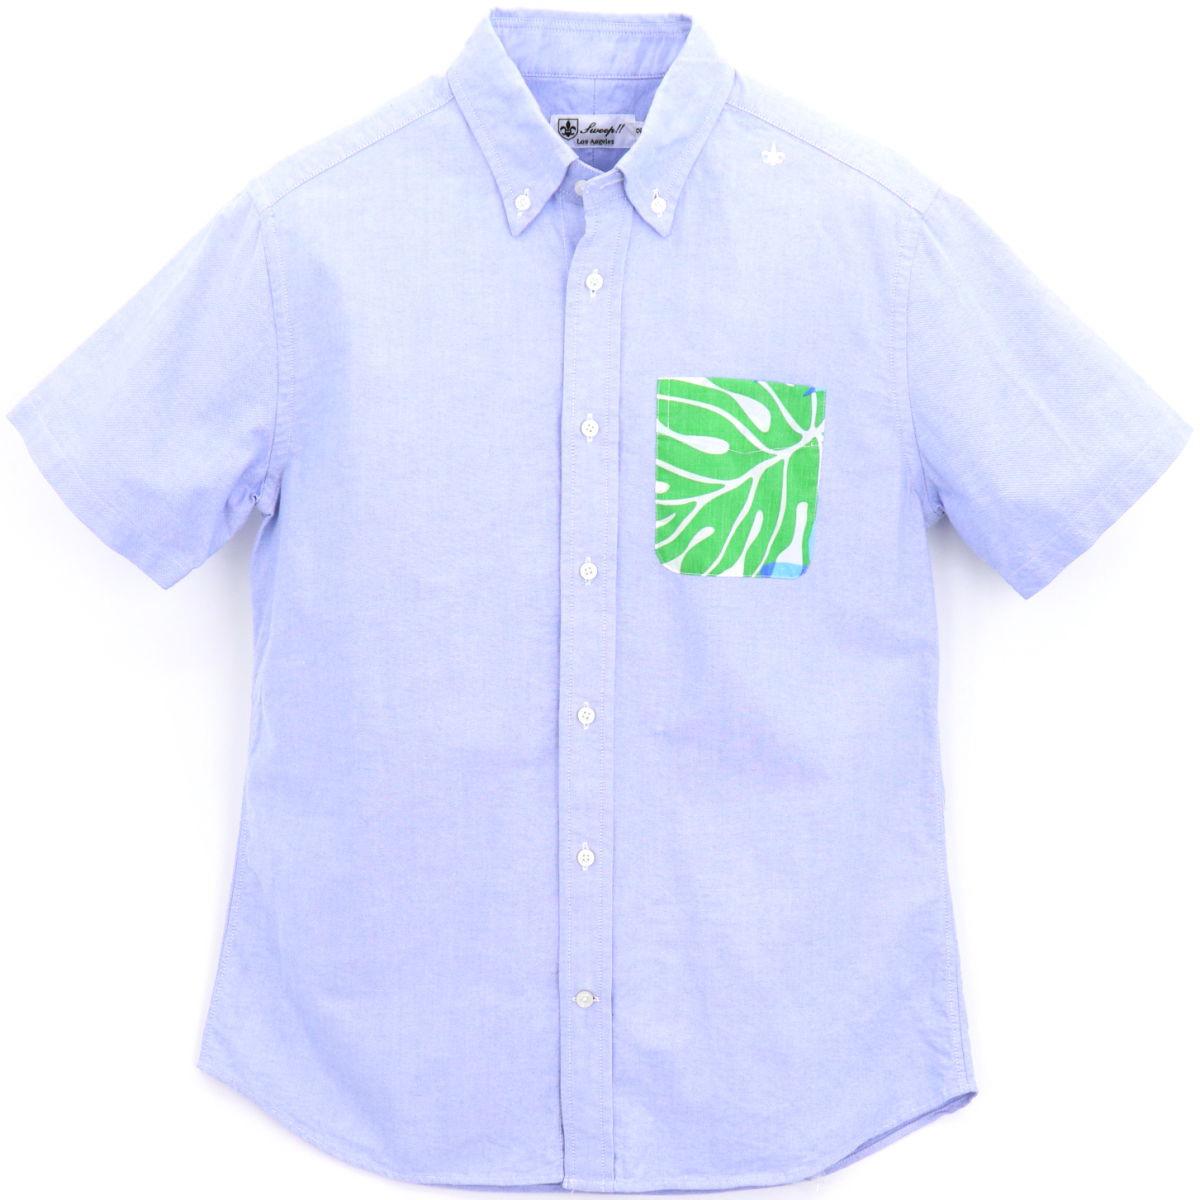 【50%OFF】オックスフォード アロハ柄 ボタンダウンシャツ(BLUE)